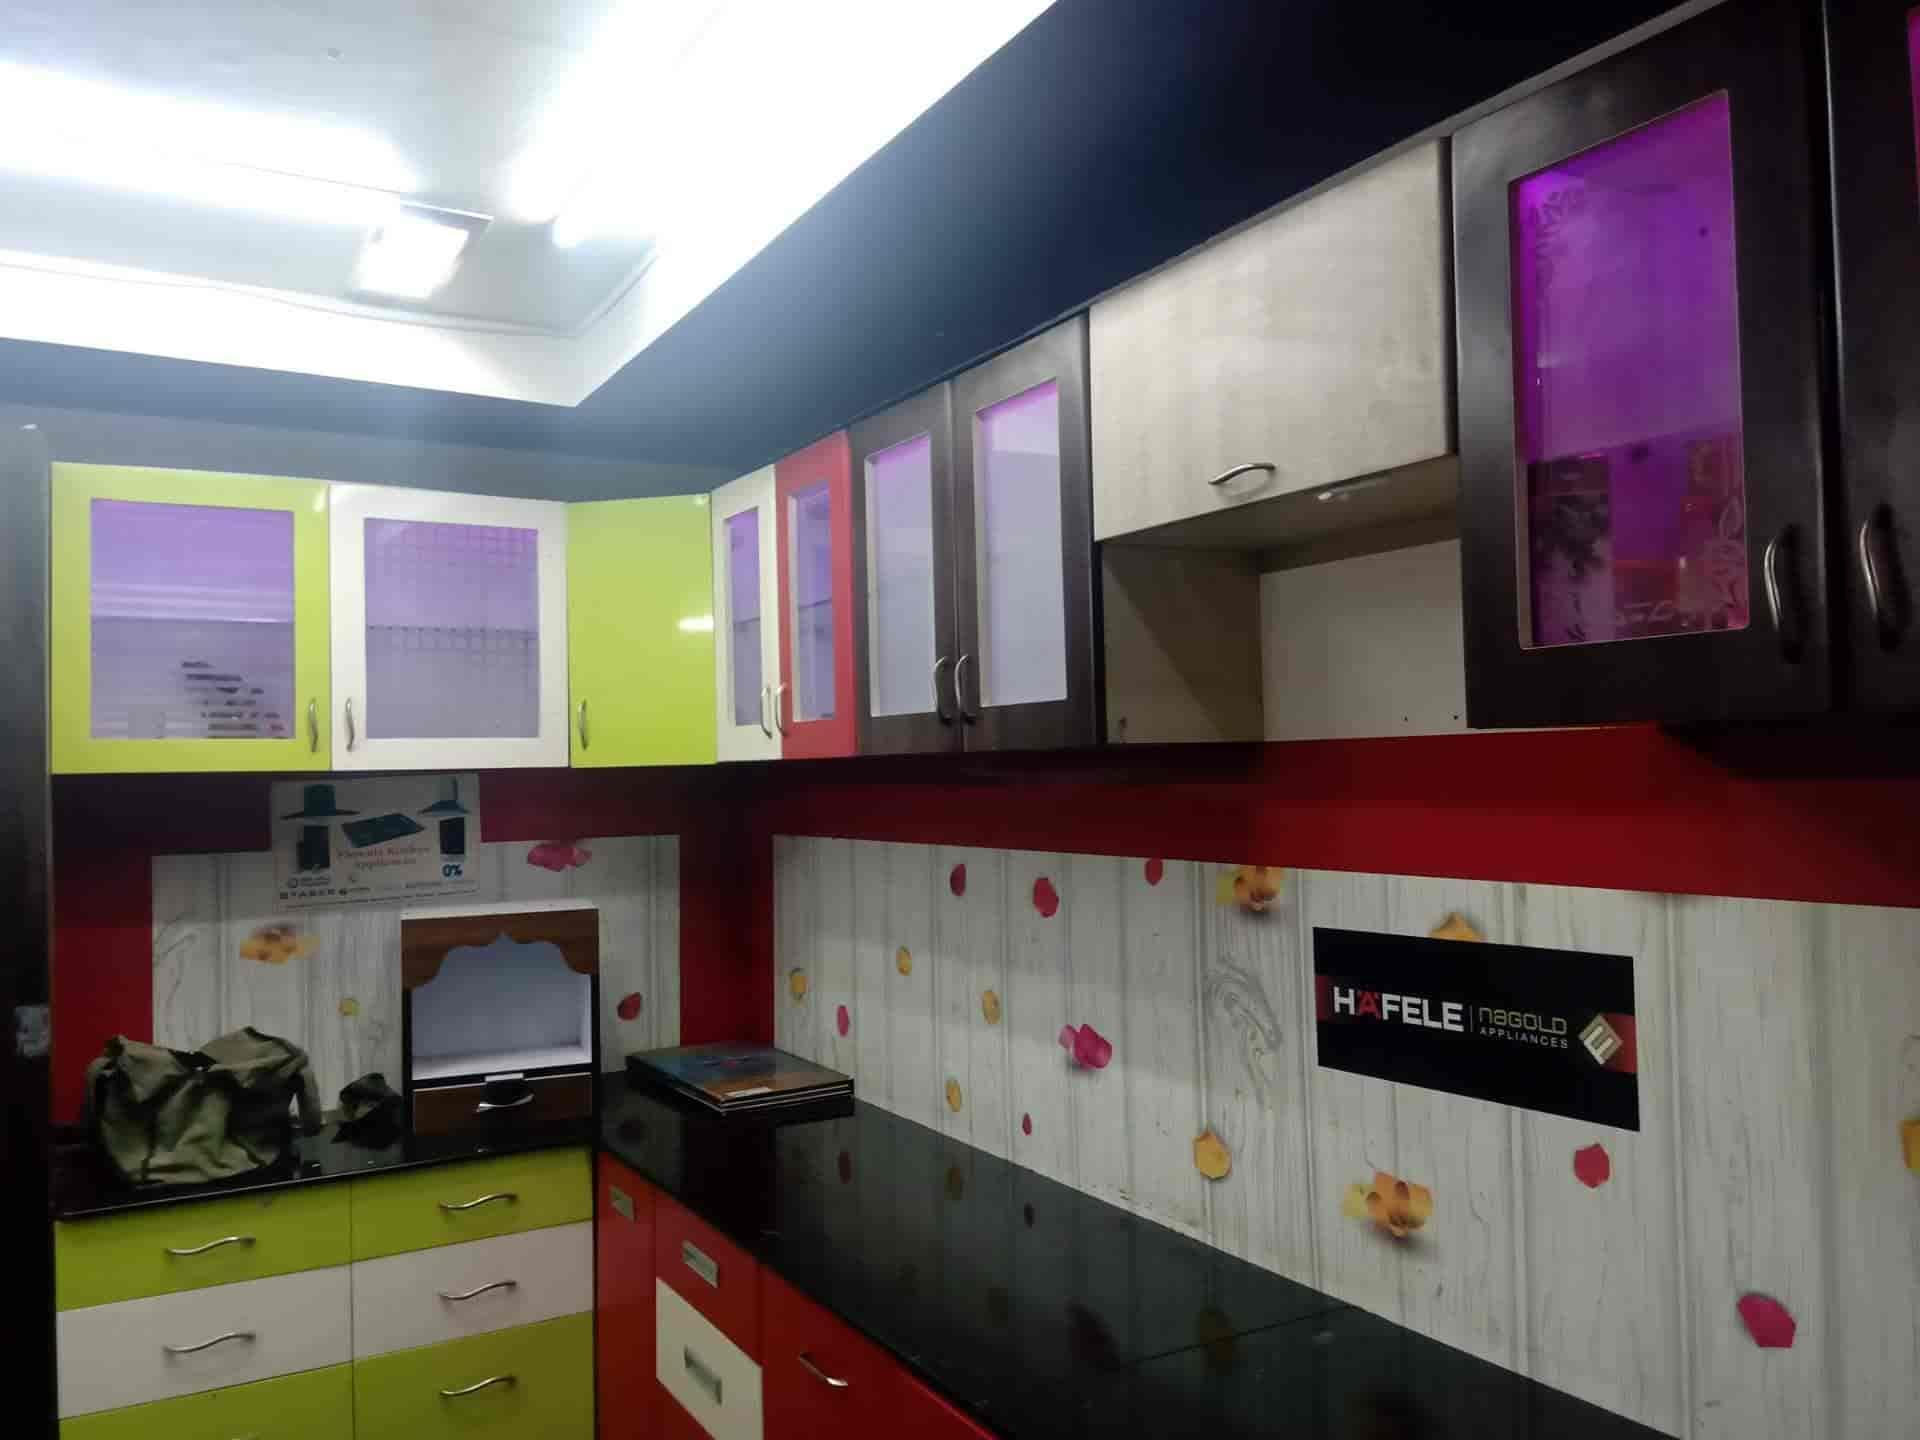 Sangam Modular Kitchen Wooden Furniture Kondhwa Budruk Kitchen Trolley Dealers In Pune Justdial